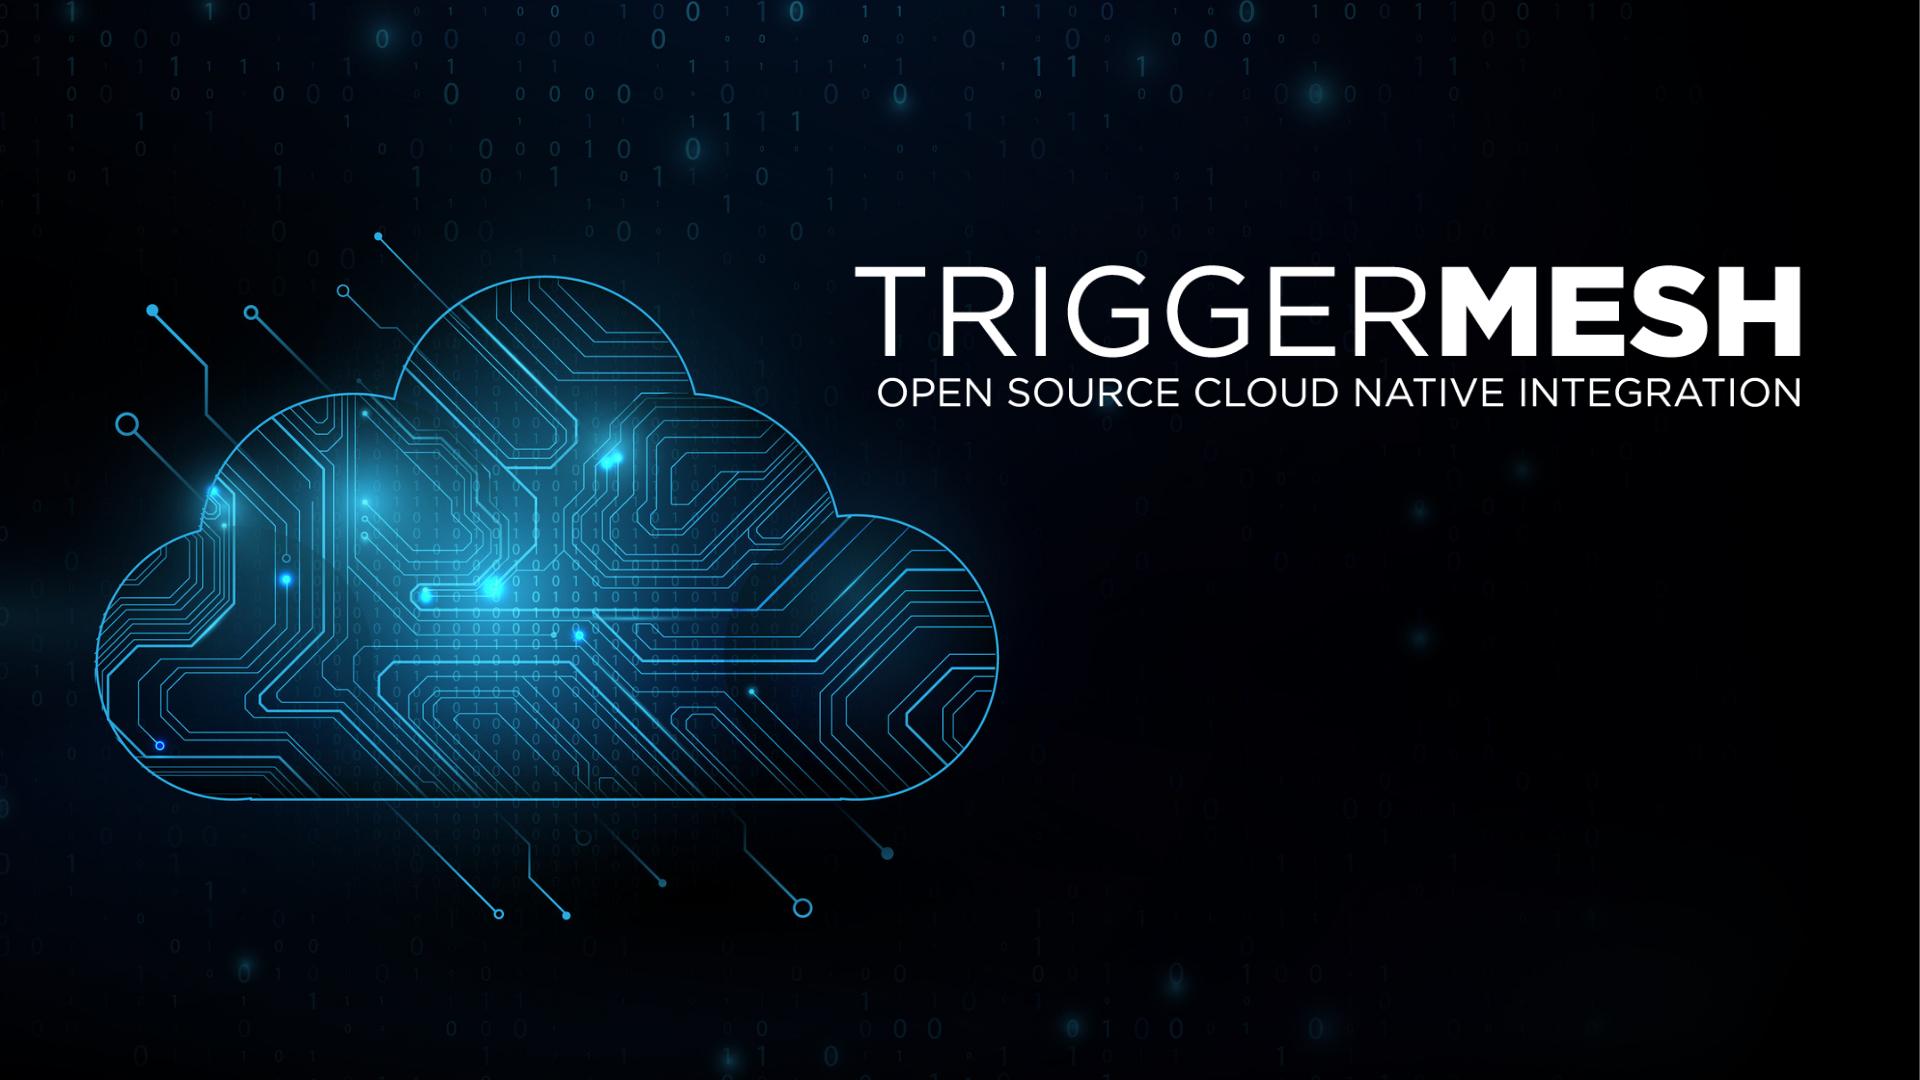 Introducing TriggerMesh Open Source